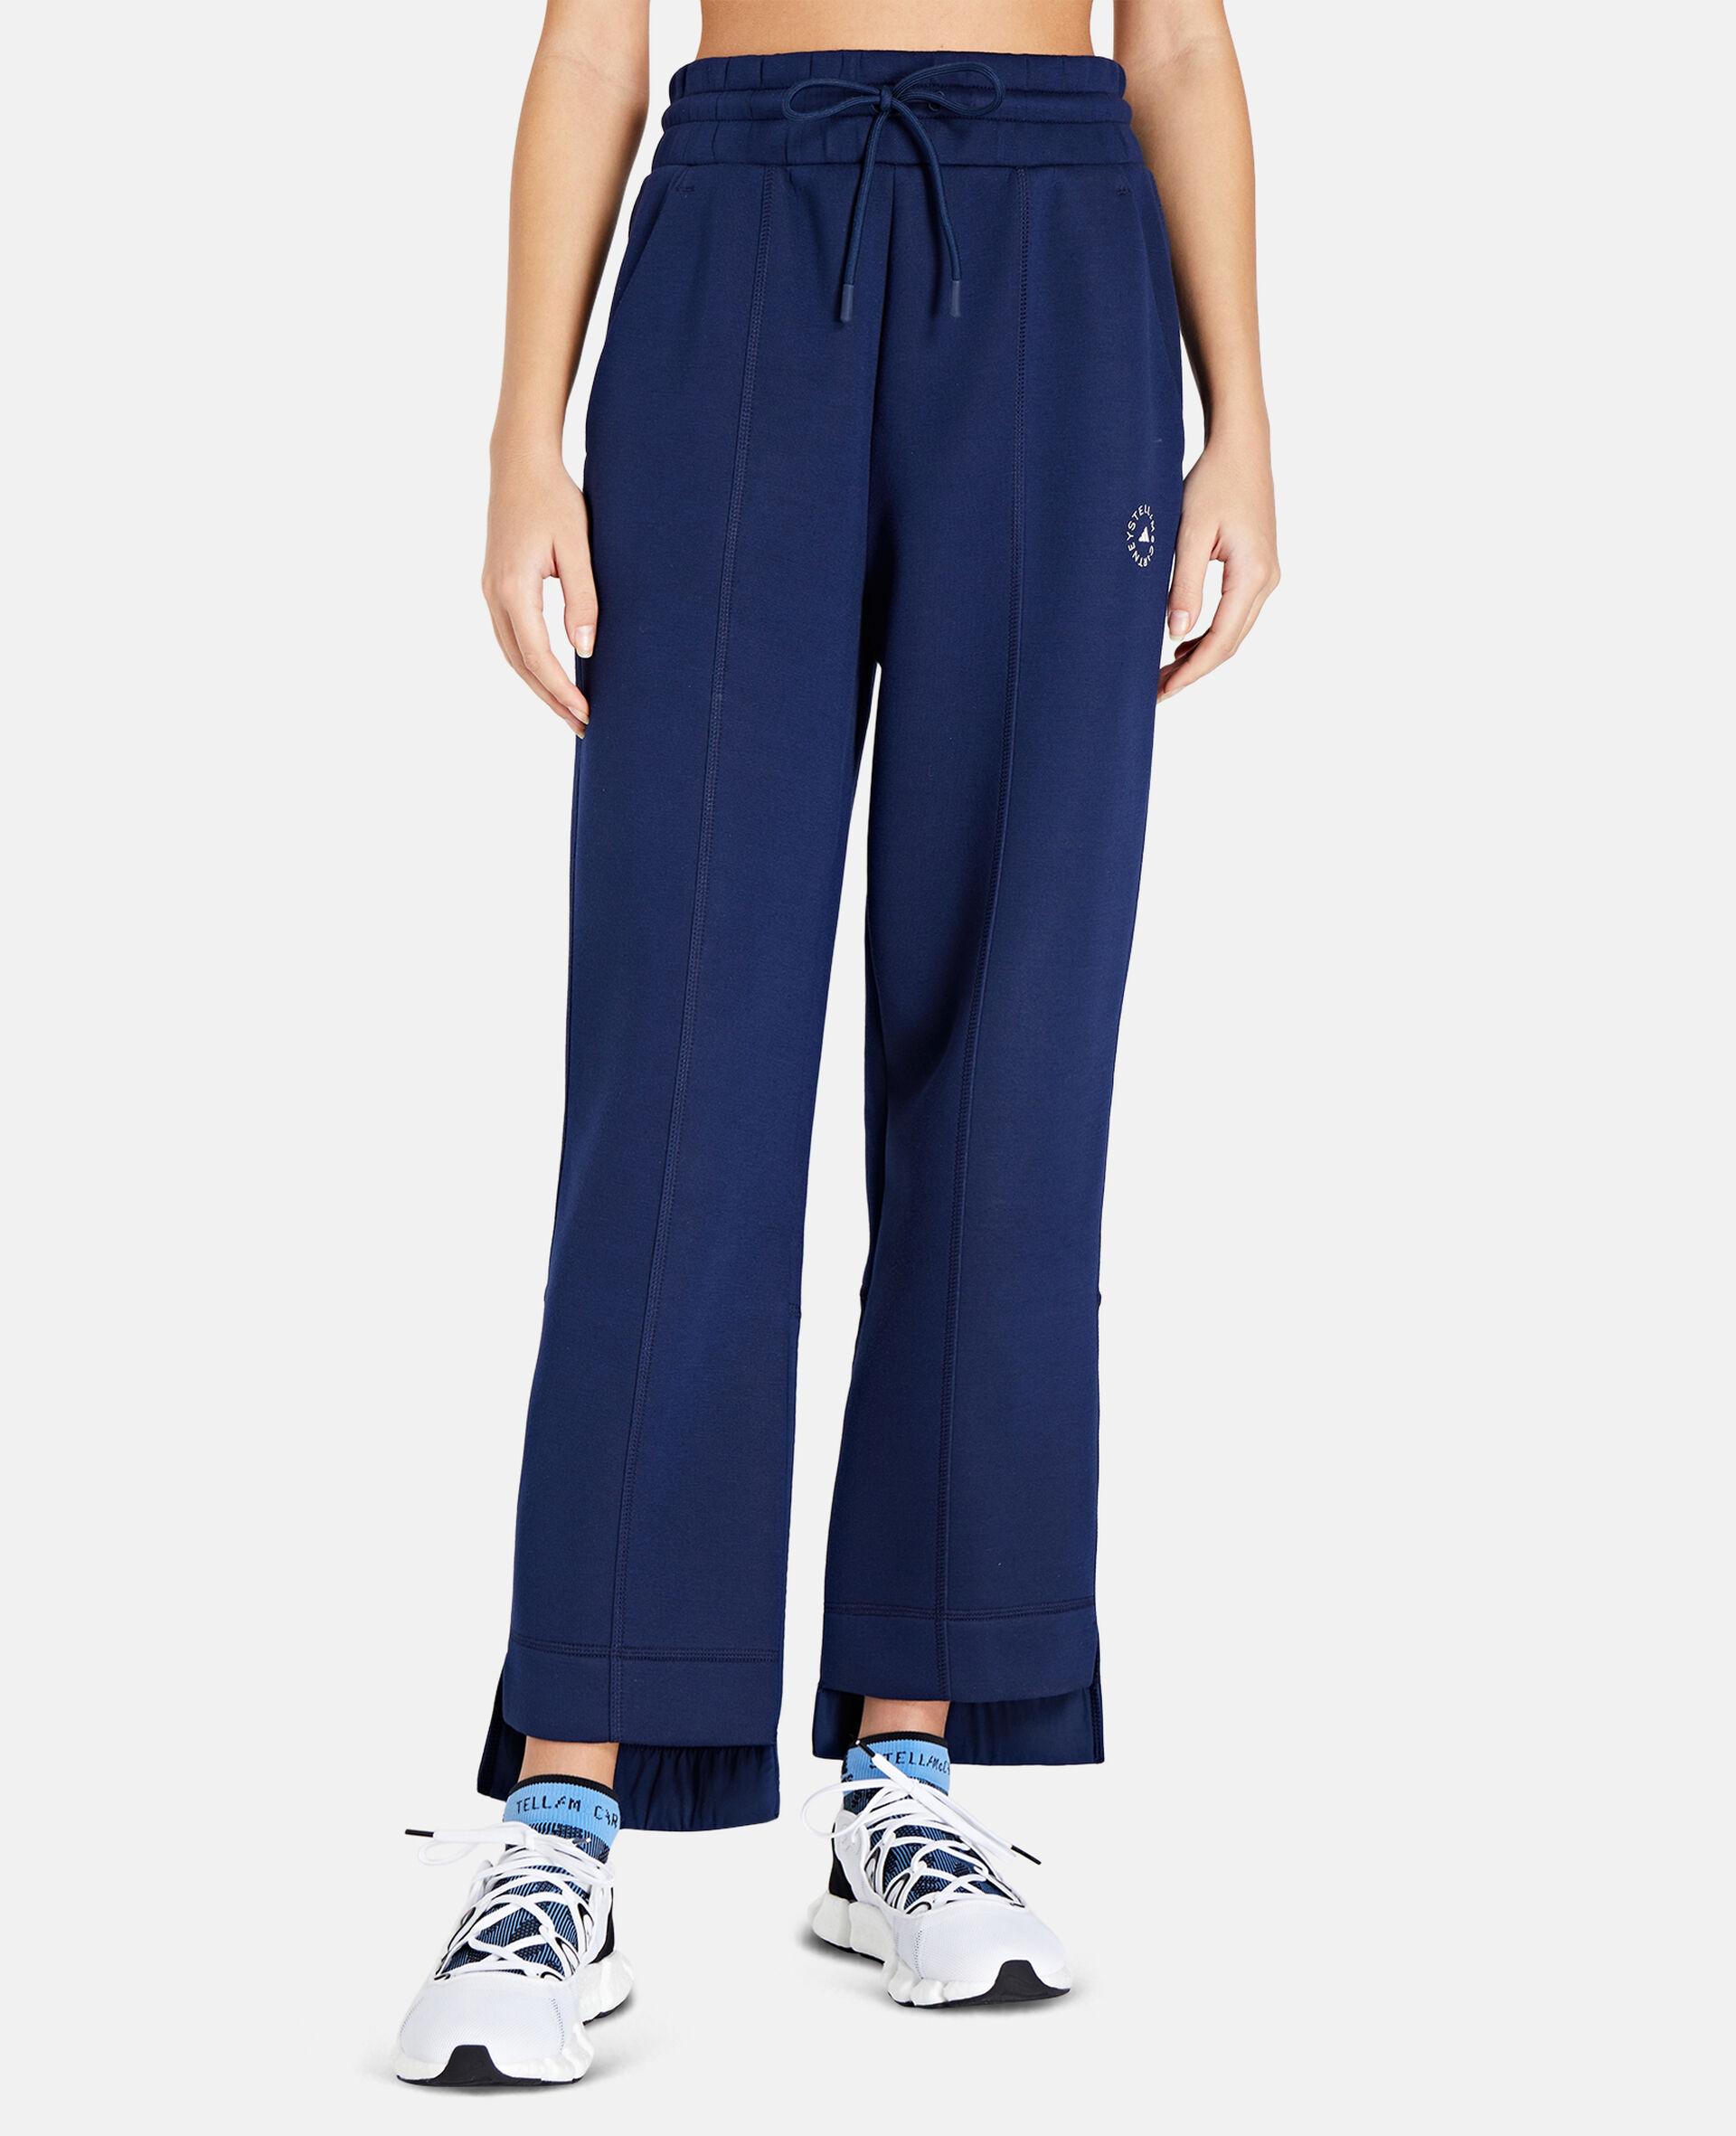 Blue Tapered Sweatpants-Blue-large image number 4